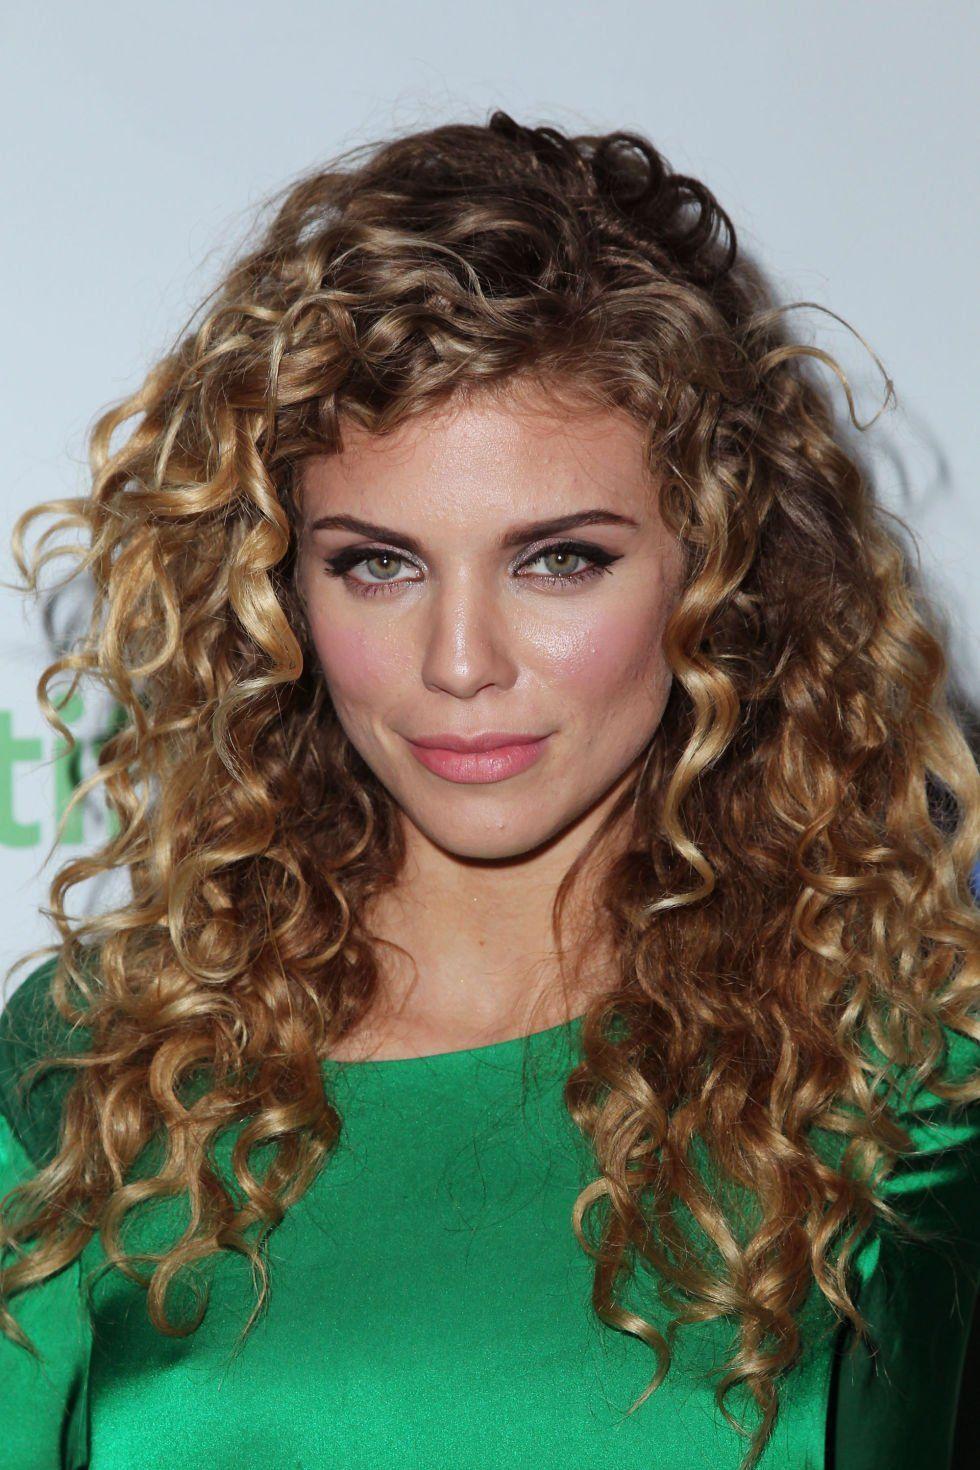 Tremendous Top 20 Beautiful Women Short Curly Hairstyles 2016 Tagli Capelli Hairstyles For Women Draintrainus